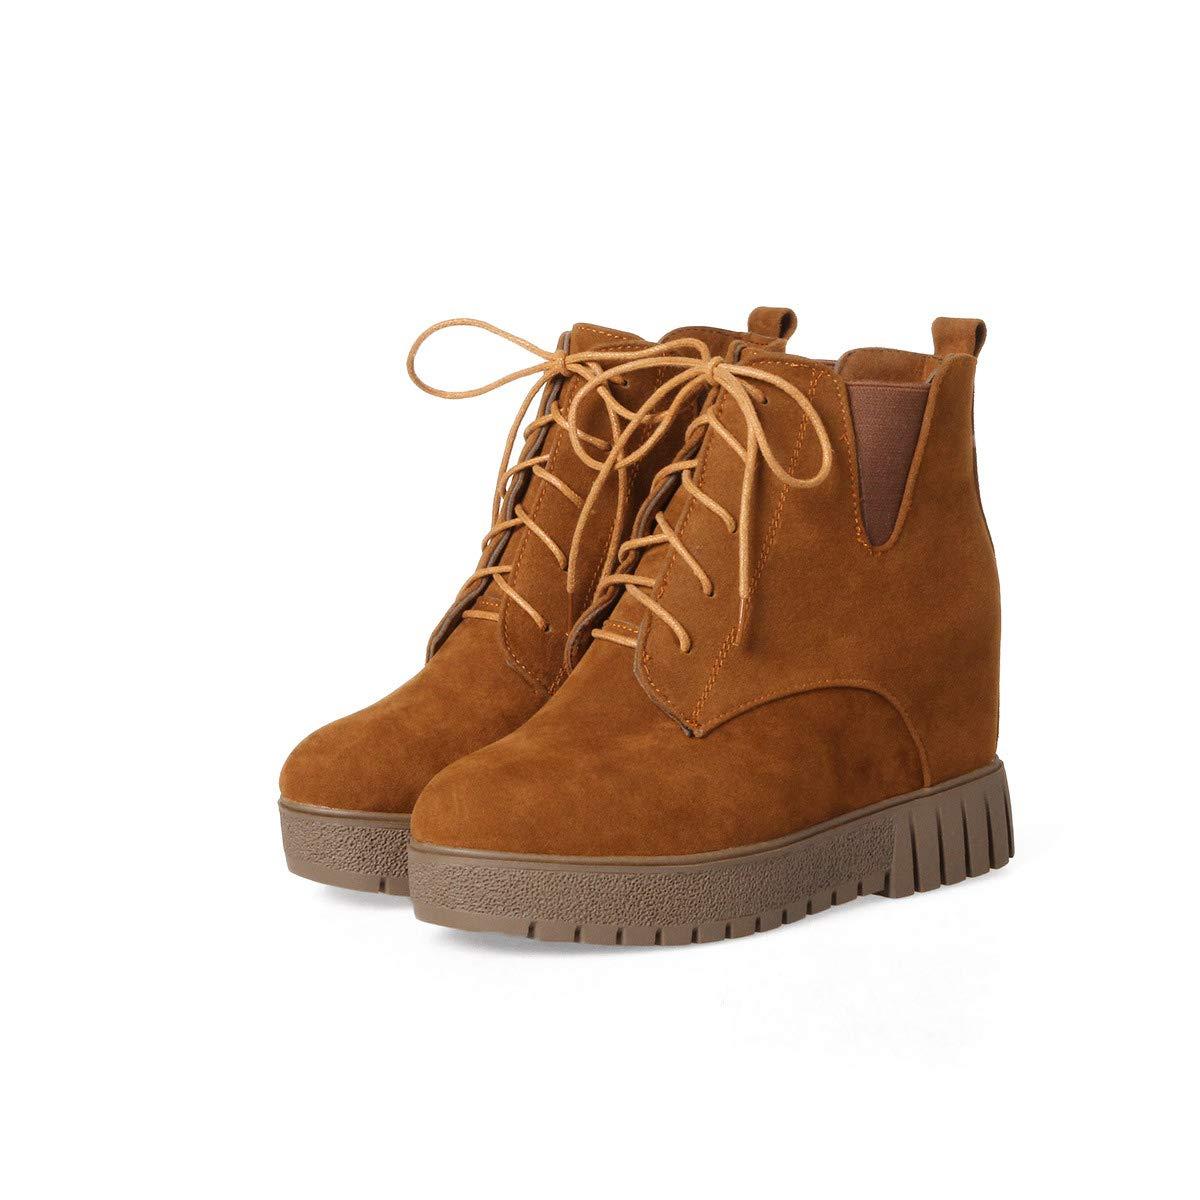 DANDANJIE Frauen Stiefel Damen High Heel Martin Stiefel Wedge Heel Lace-Schuhe Buckle-Strap Ankle Stiefel